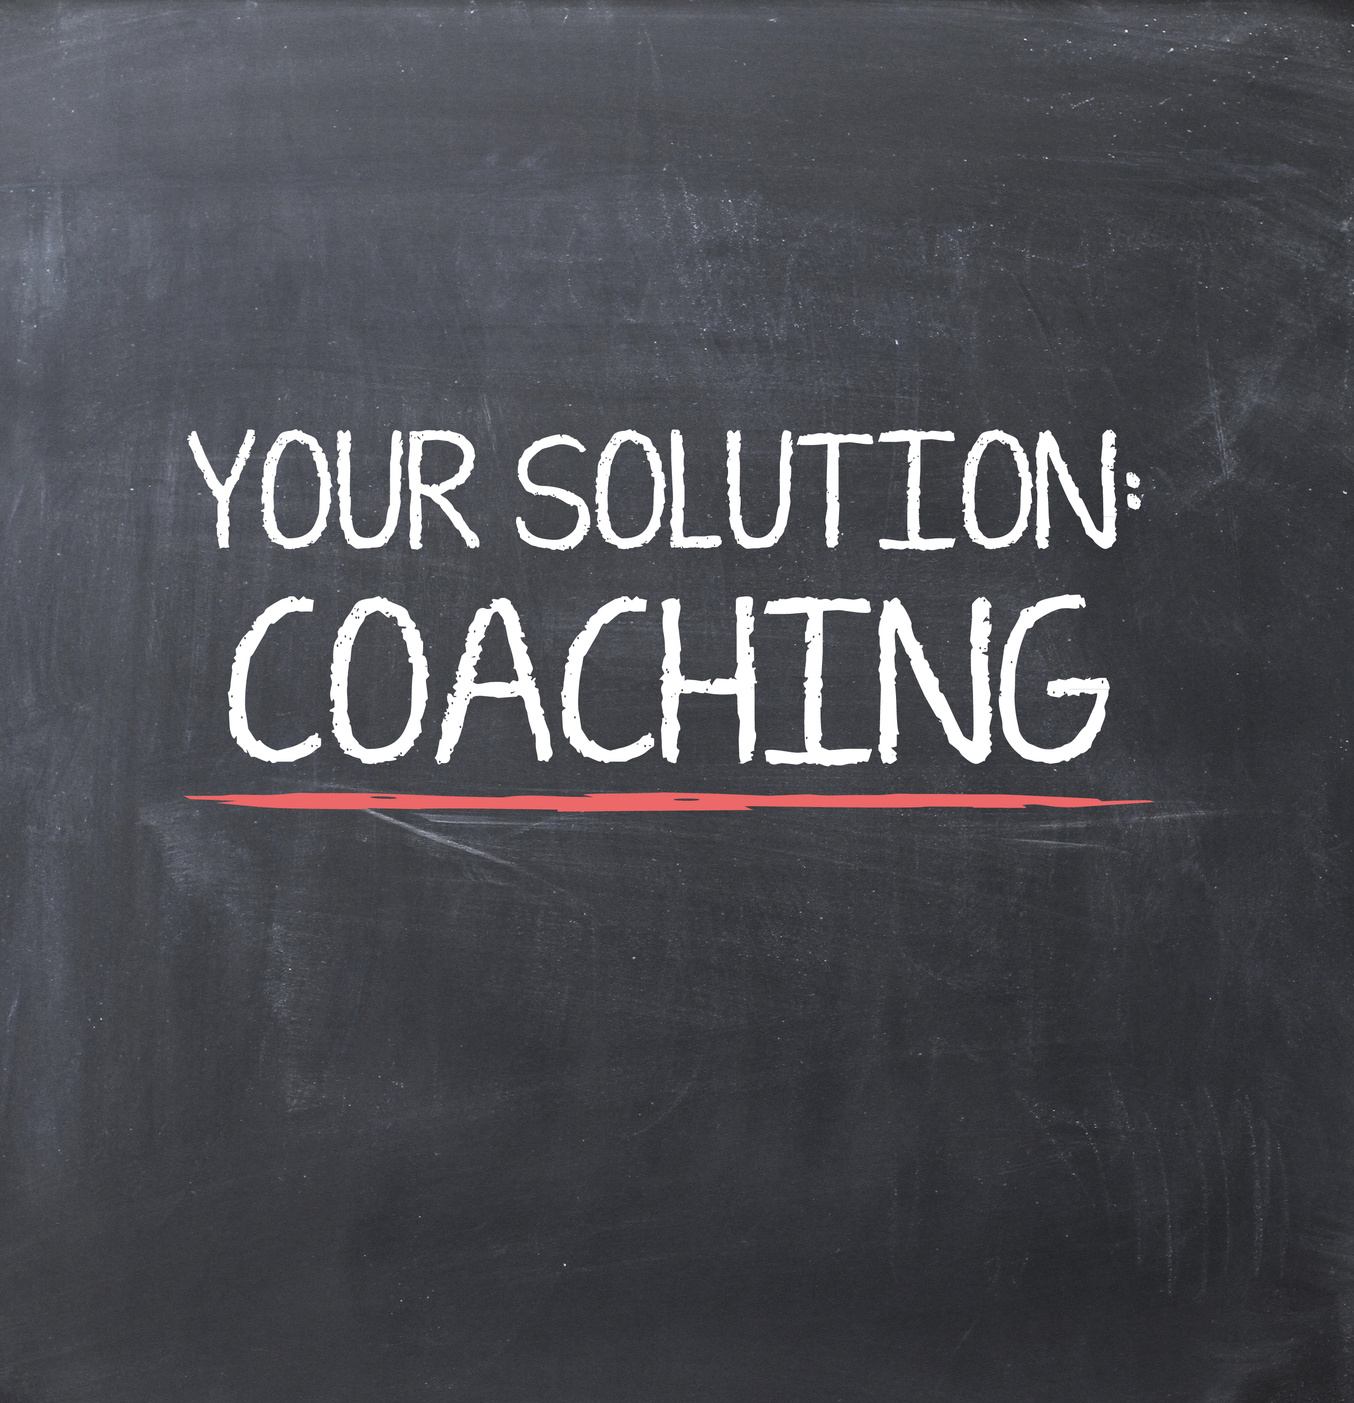 coaching_solution-1.jpg